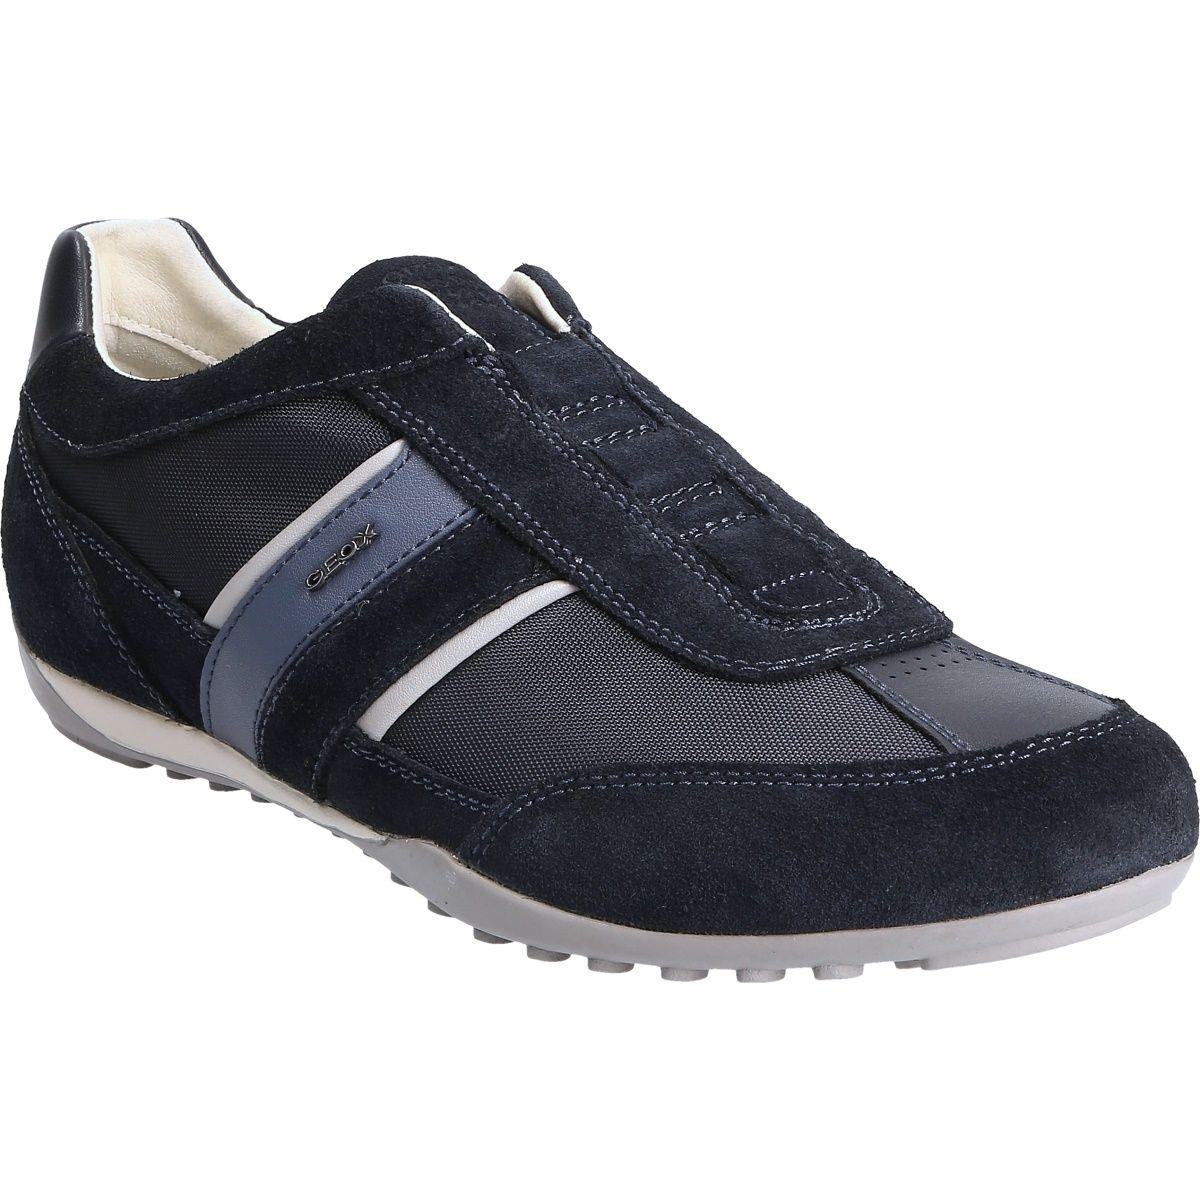 Geox Shoes Online Ireland